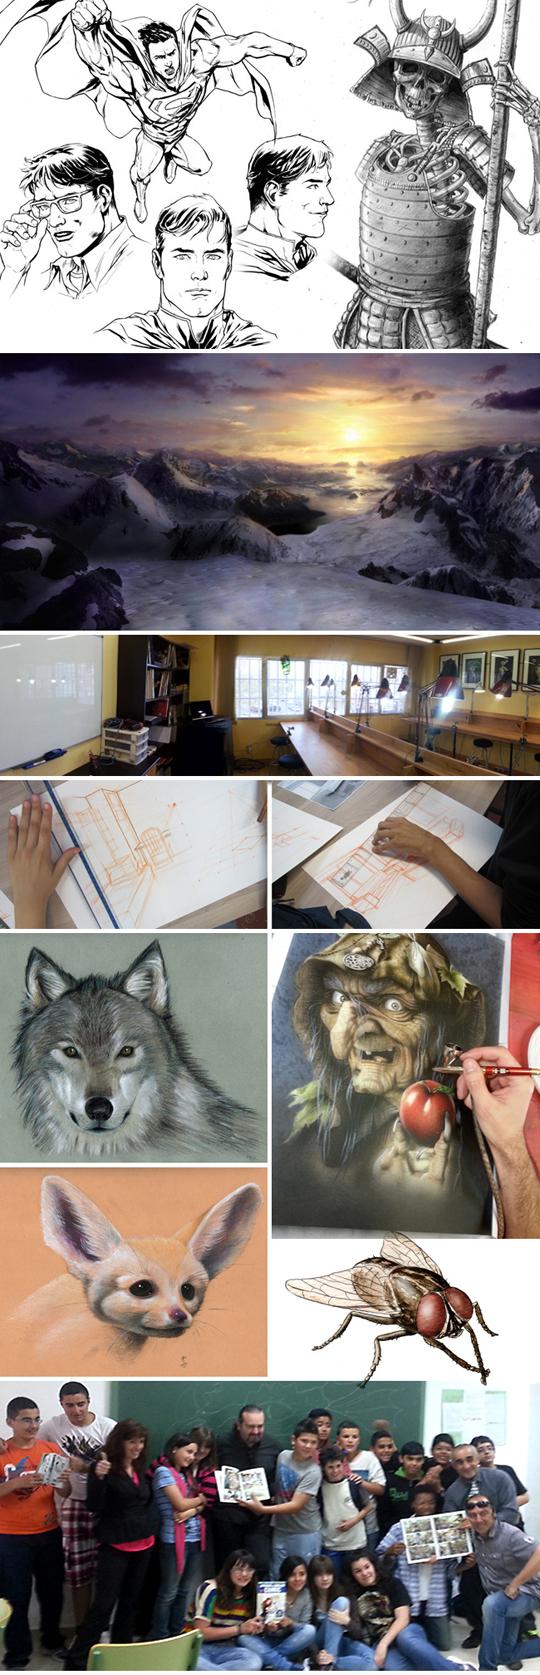 Master-C10-Academia-C10-aulas-de-dibujo-comic-ilustracion-aerografia-dibujo-digital-manga-fx-maquillaje-3_540